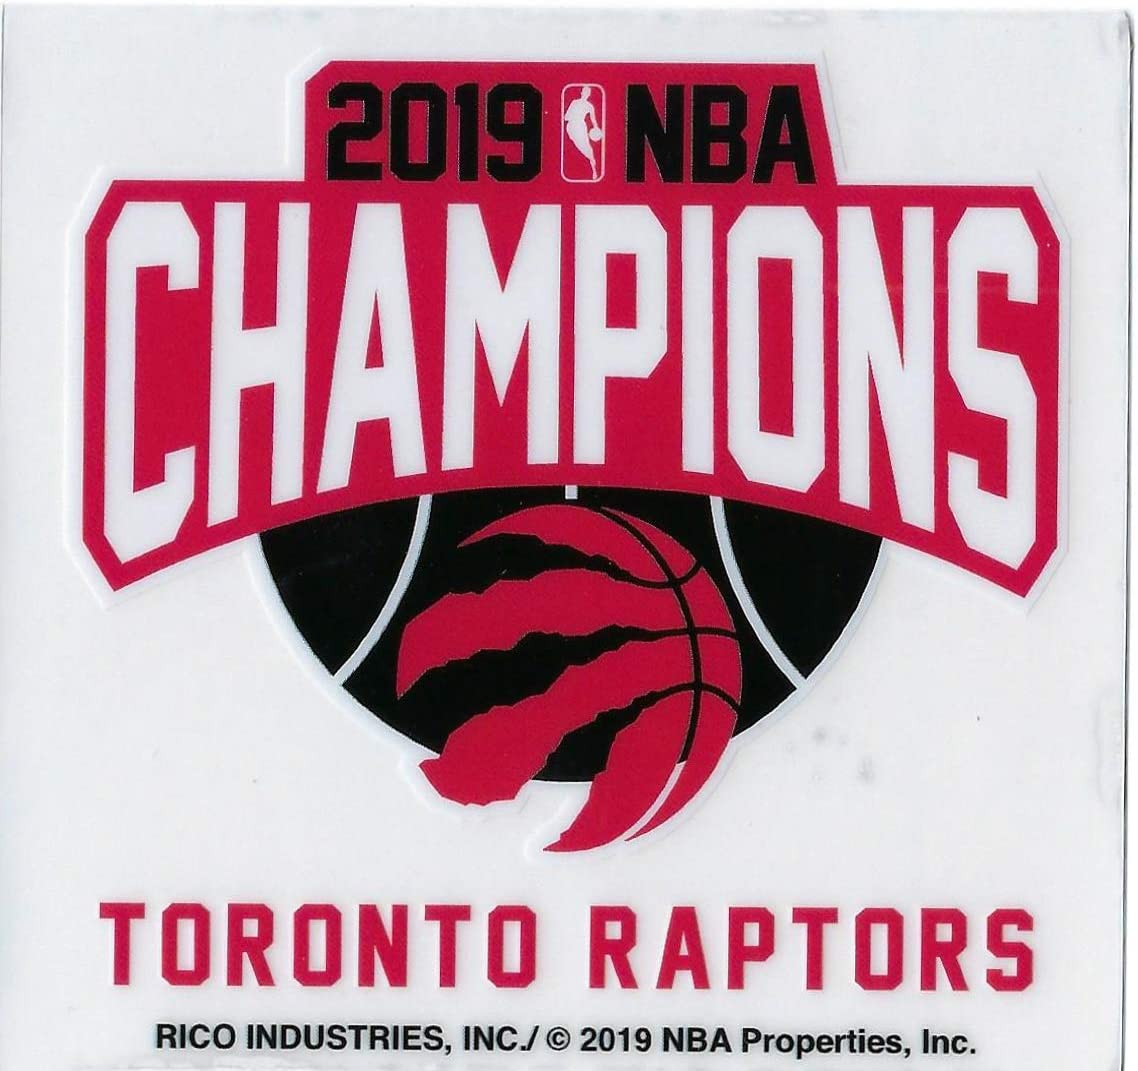 Toronto Raptors 2019 NBA Champions 3.75 x 3.5 Inch Vinyl Cling Decal